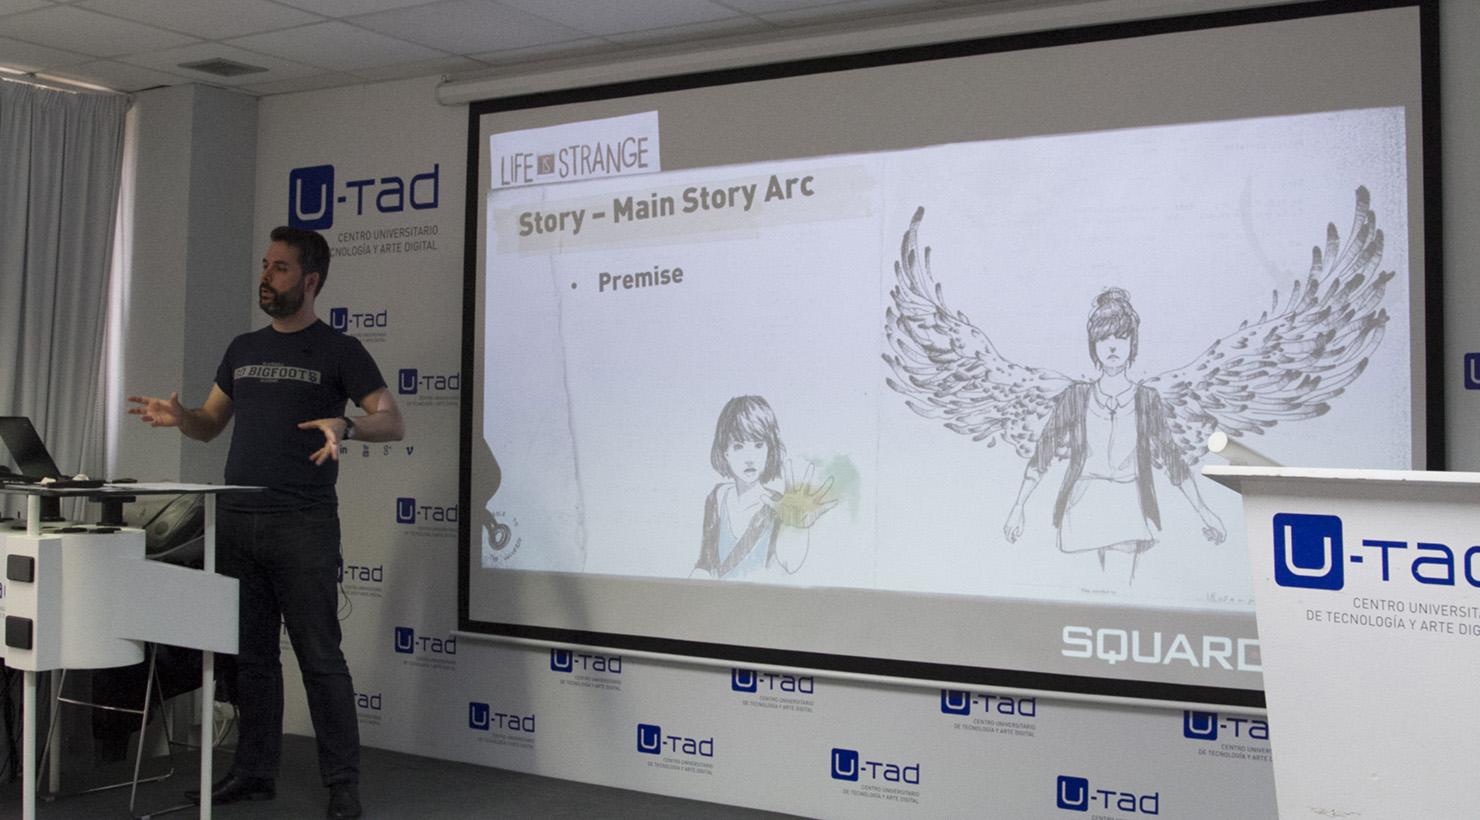 Life is Strange Square Enix U-tad